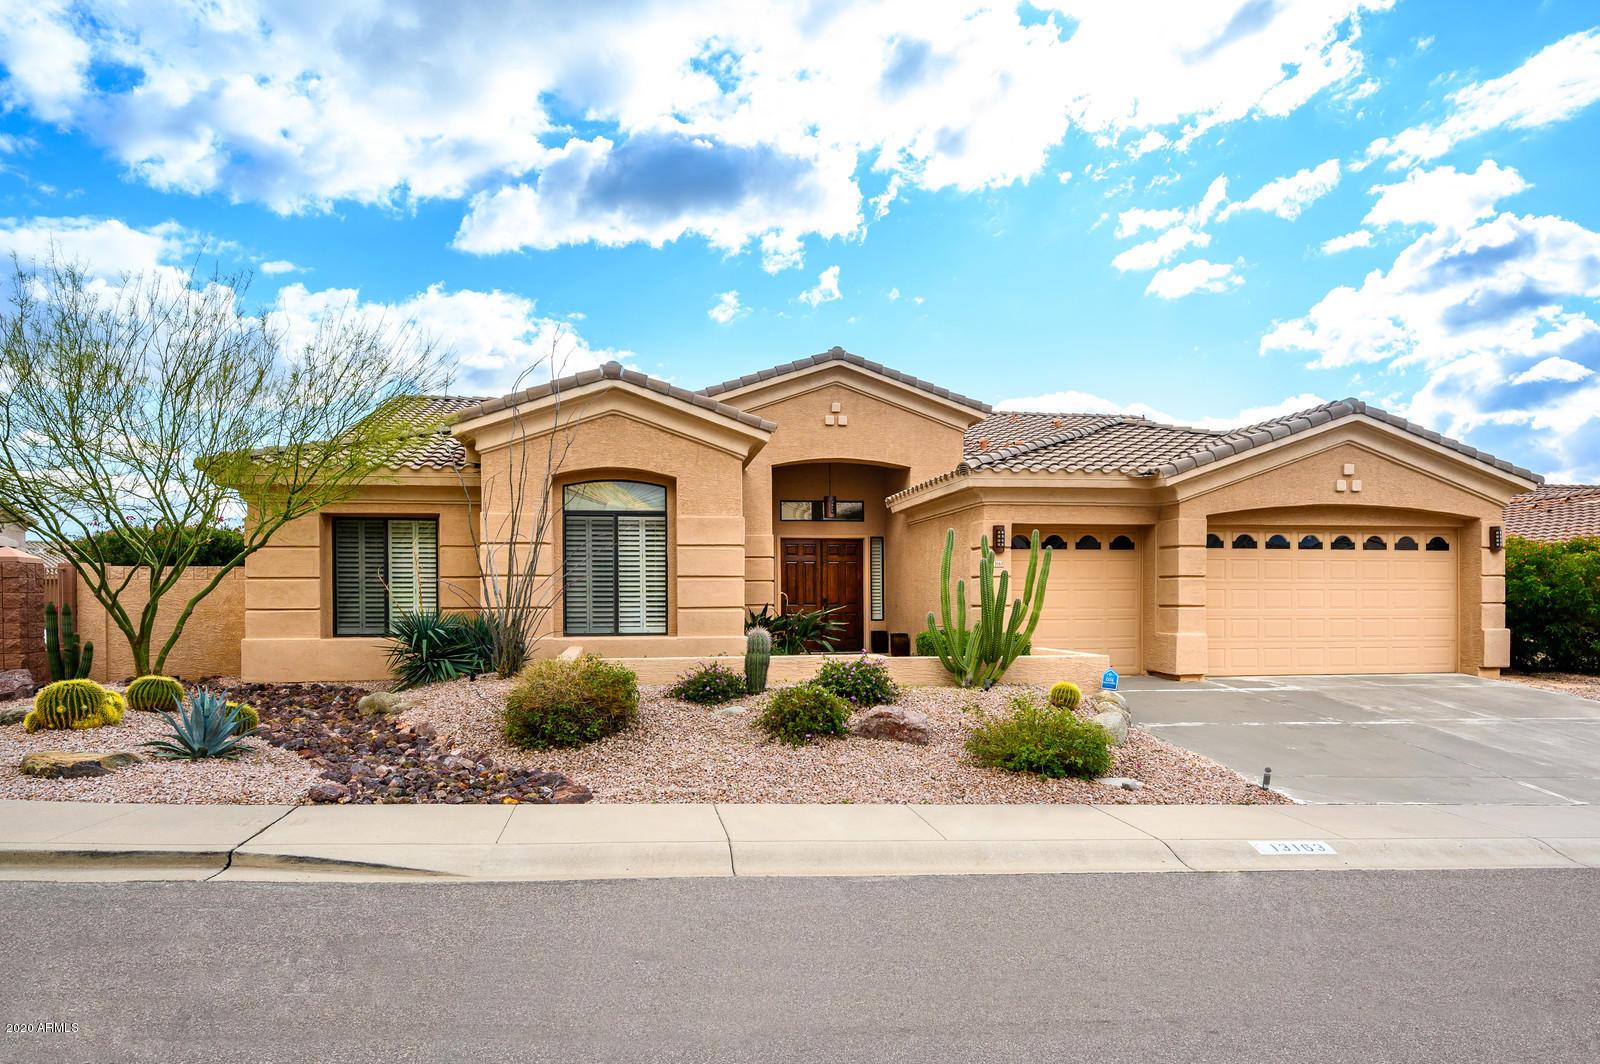 Photo of 13163 E LUPINE Avenue, Scottsdale, AZ 85259